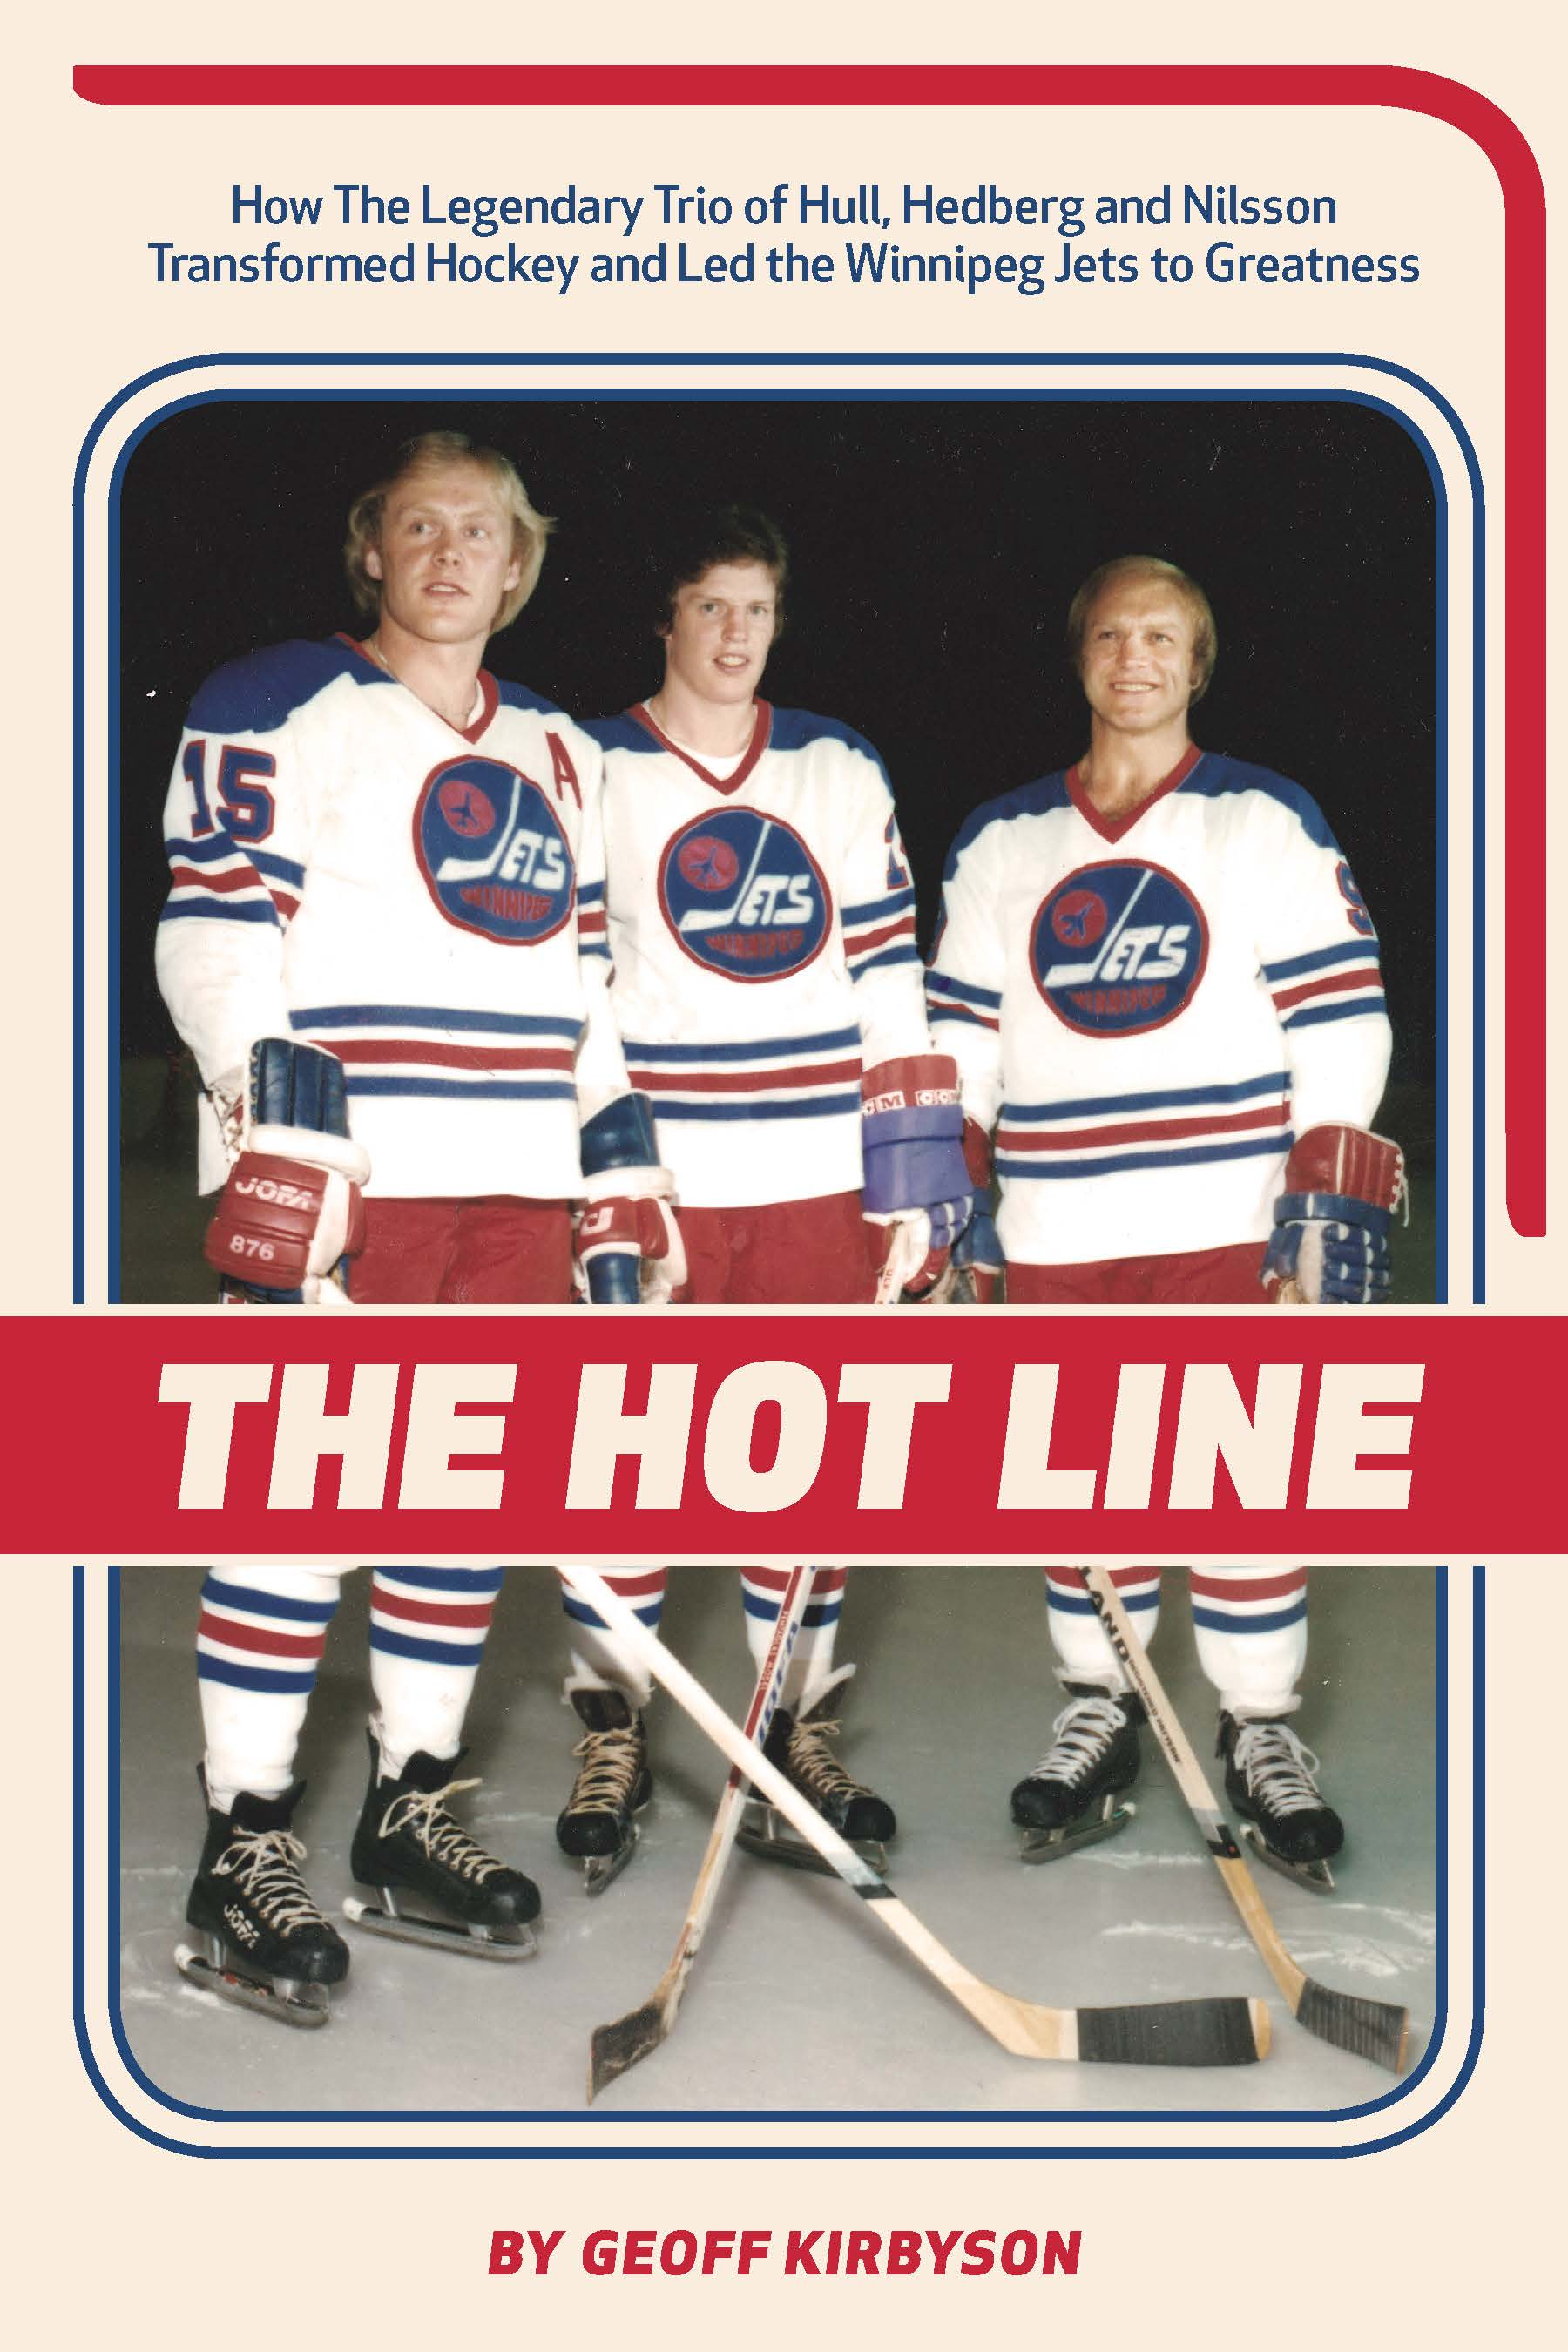 The Hot Line by Geoff Kirbyson